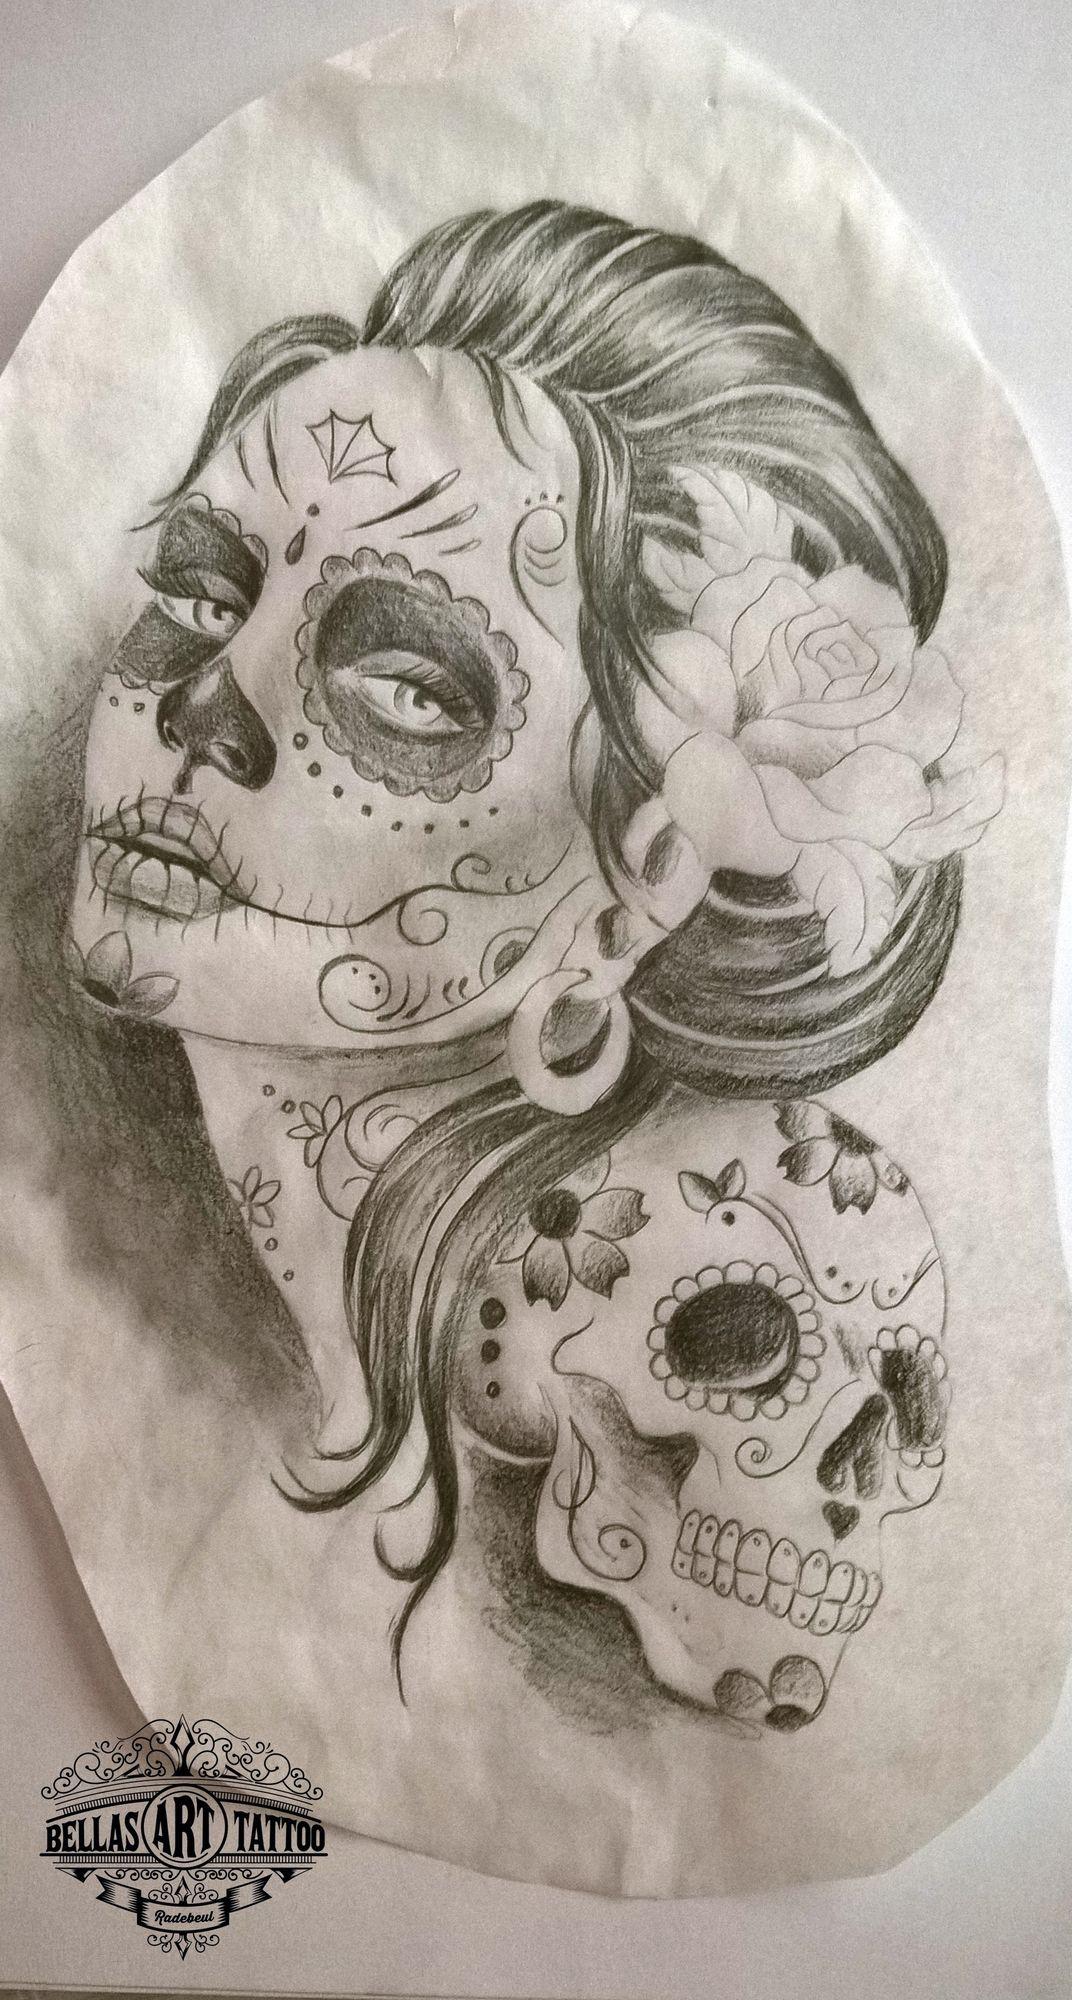 Galerie - Bellas Art Tattoo